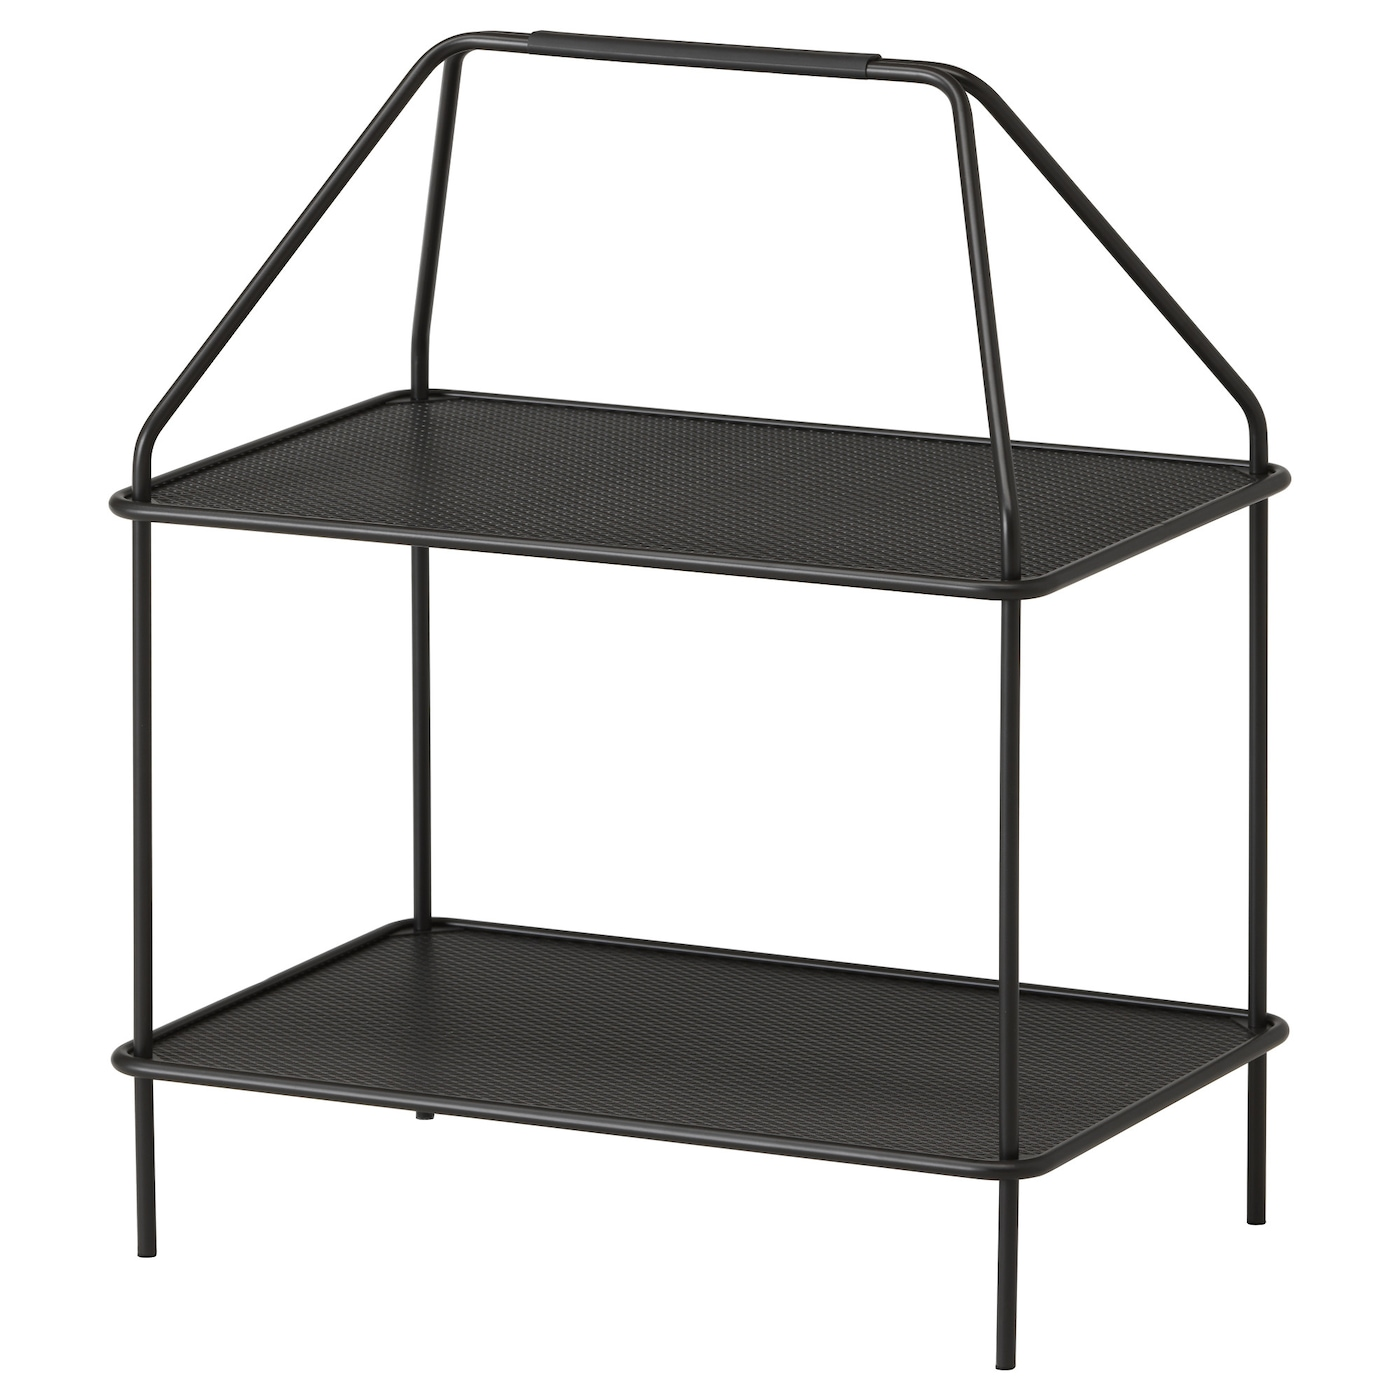 ypperlig magazine stand dark grey 55 x 36 cm ikea. Black Bedroom Furniture Sets. Home Design Ideas